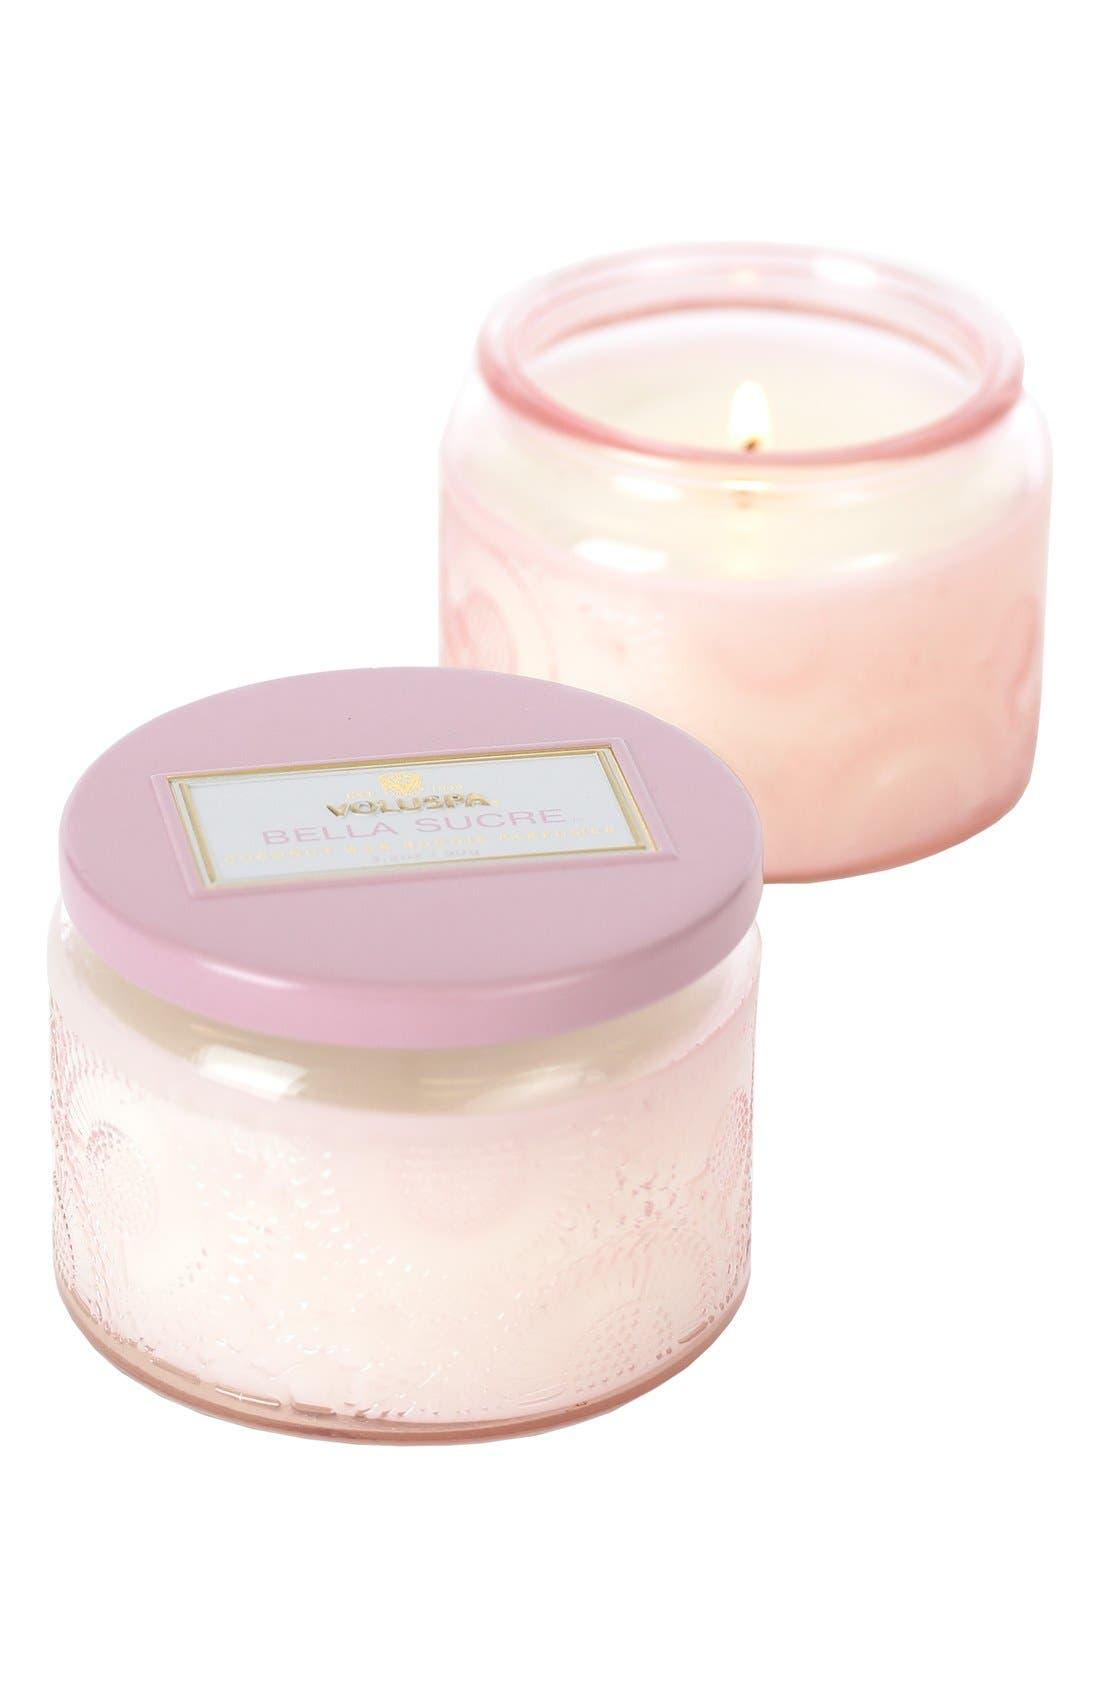 'Japonica - Bella Sucre' Petite Colored Jar Candle,                         Main,                         color, 000